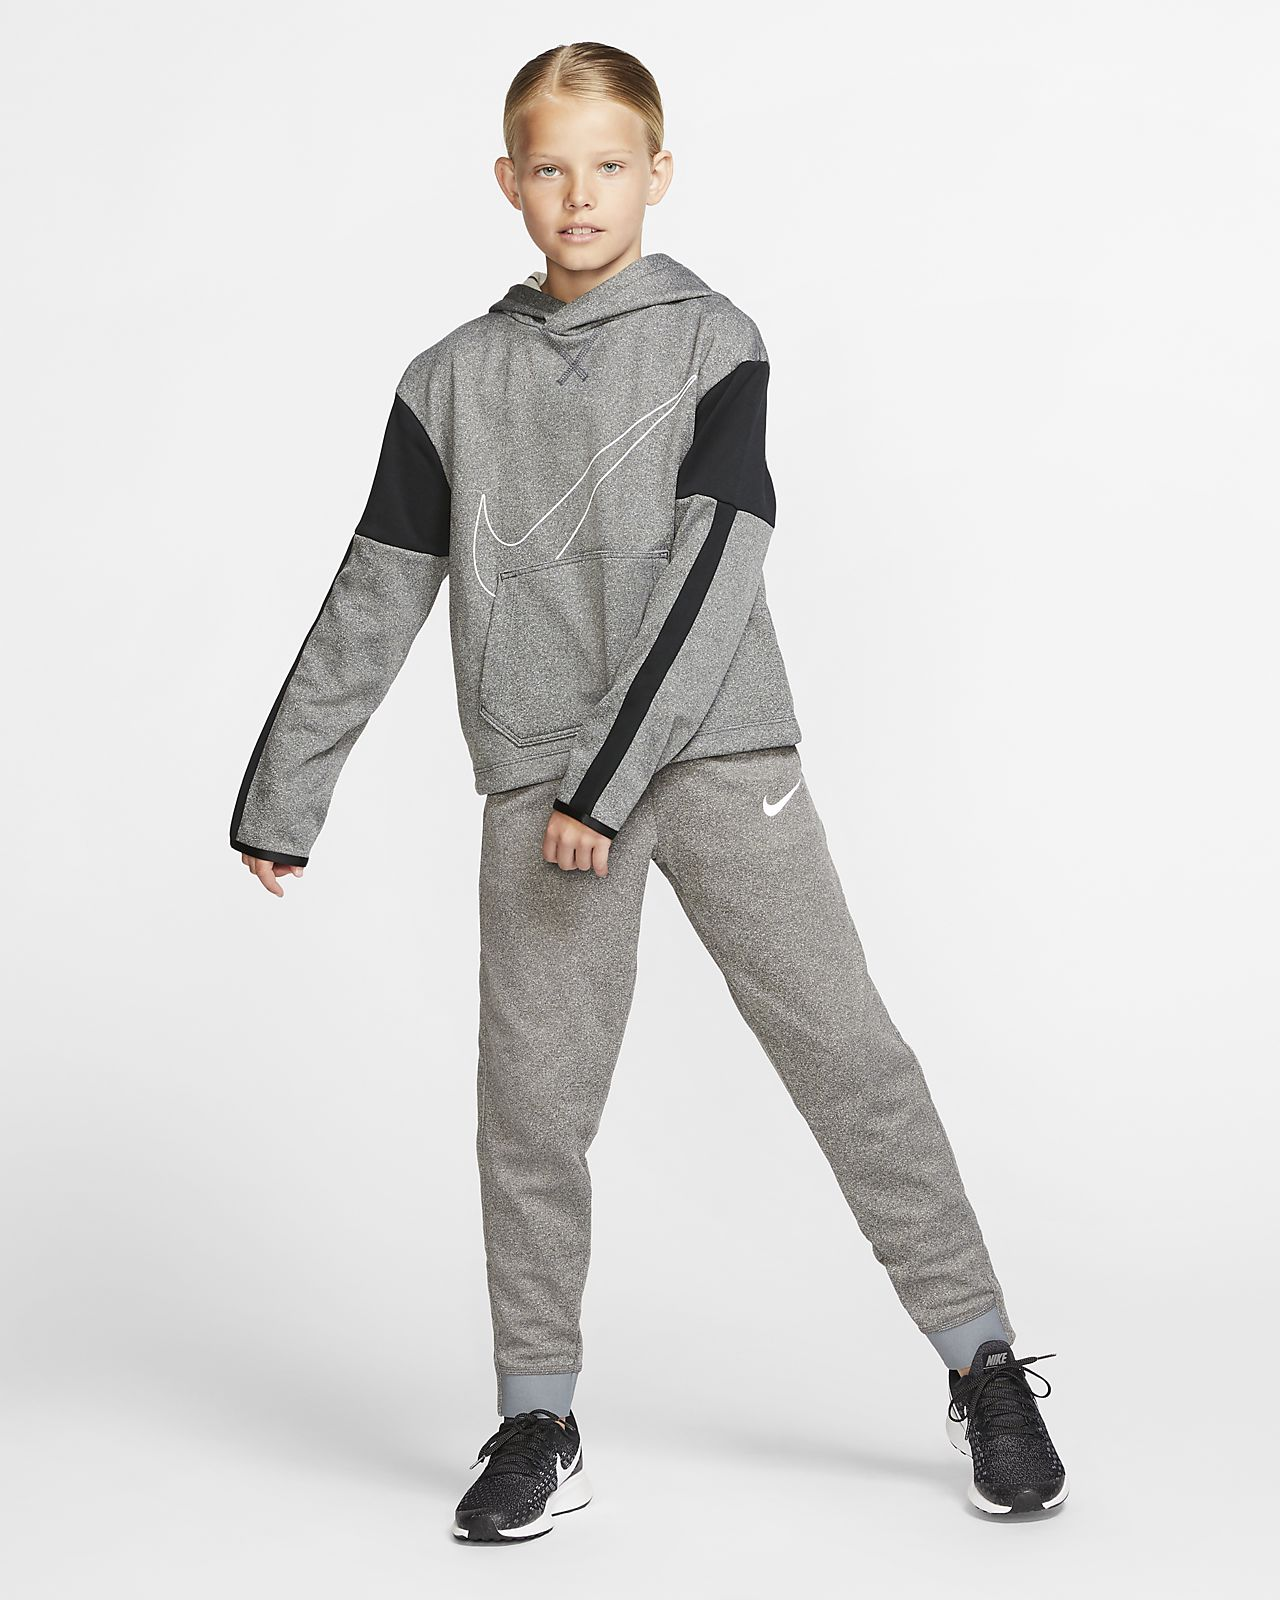 Nike Girls Therma Fit Graphic Sweatshirt